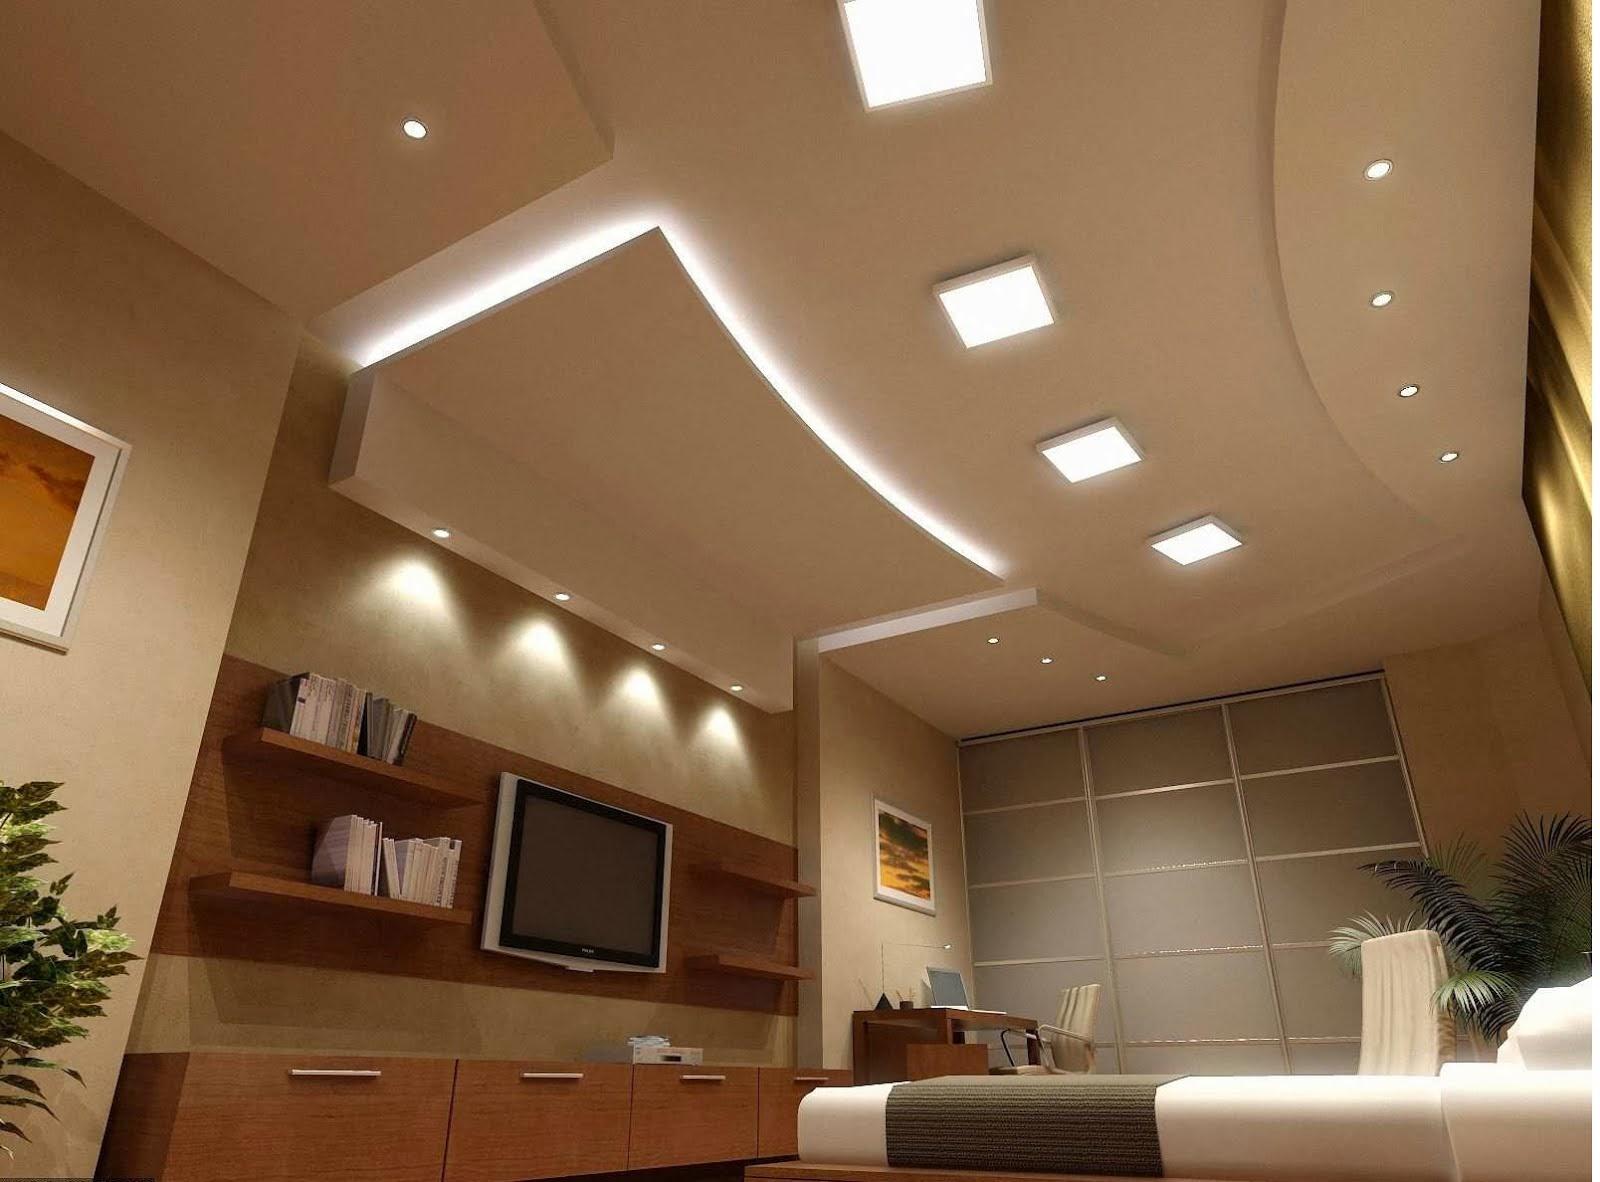 Best Design Ideas: Bedroom Ceiling Design